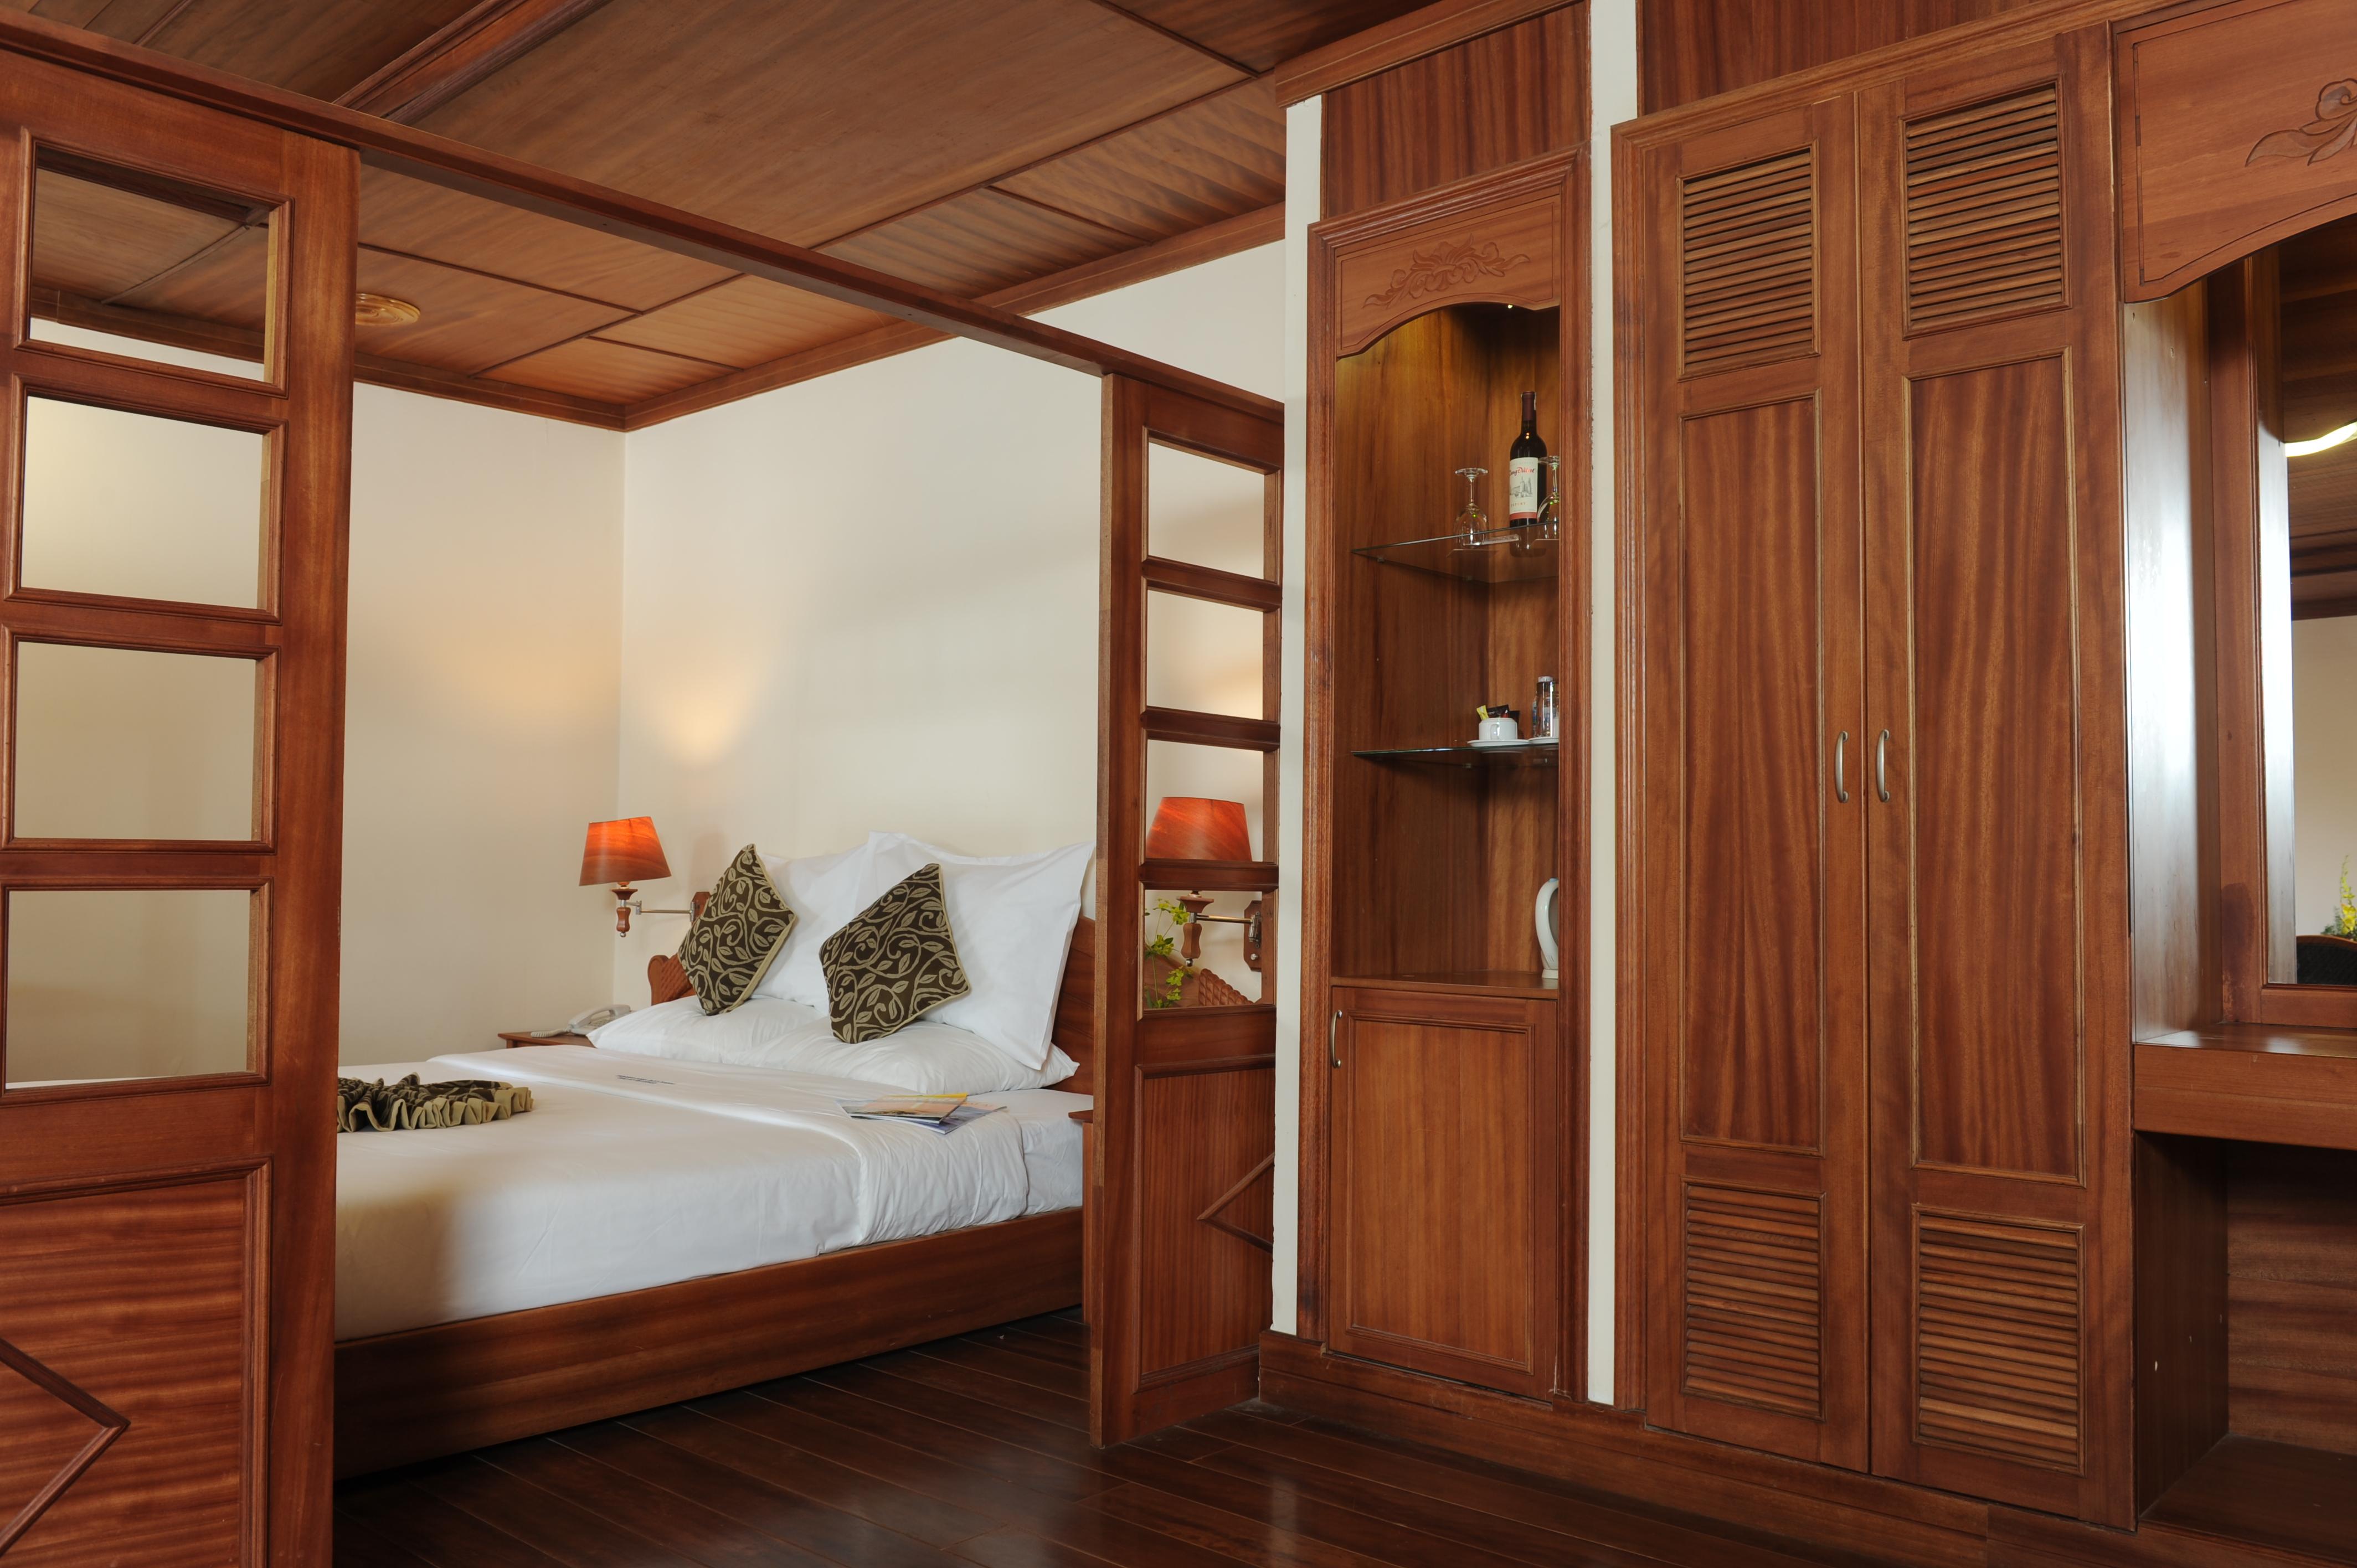 https://s3-ap-southeast-1.amazonaws.com/viettrip/Hotels/82/113151_03112016_img6296.jpg